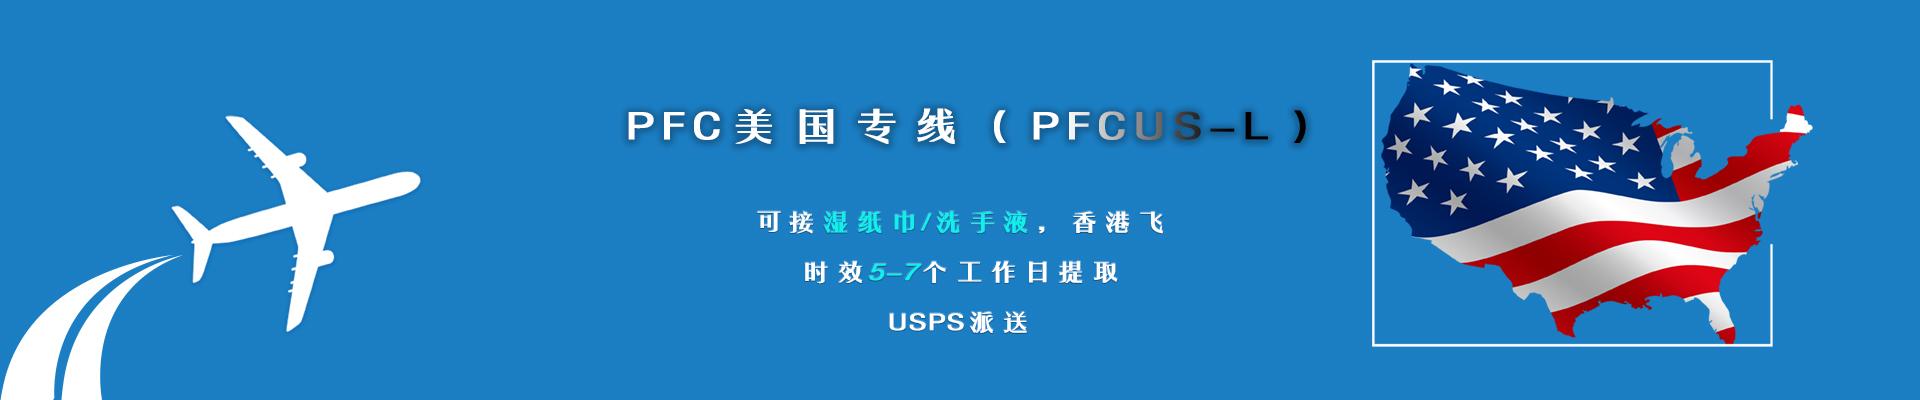 PFC美国DHL小包